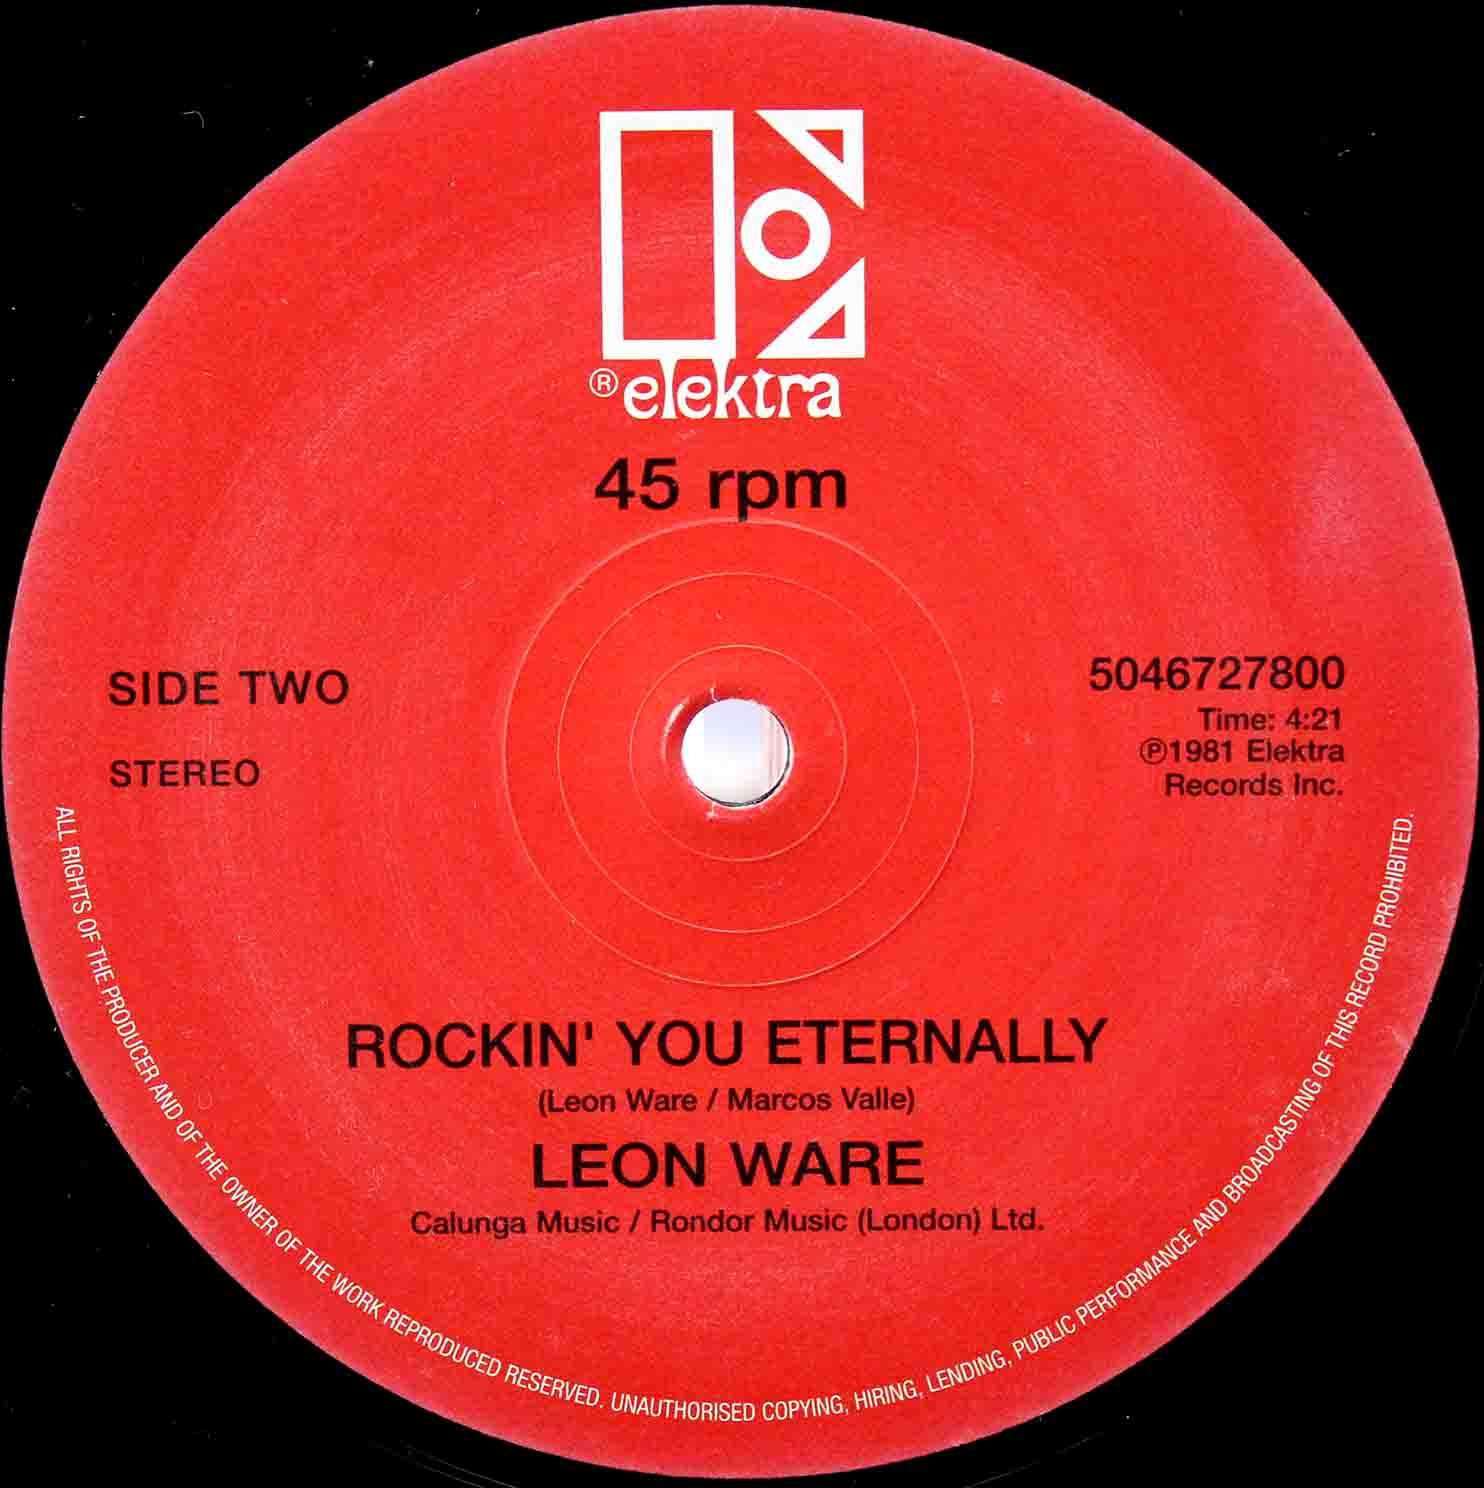 Leon Ware Rockin You Eternally 12 02